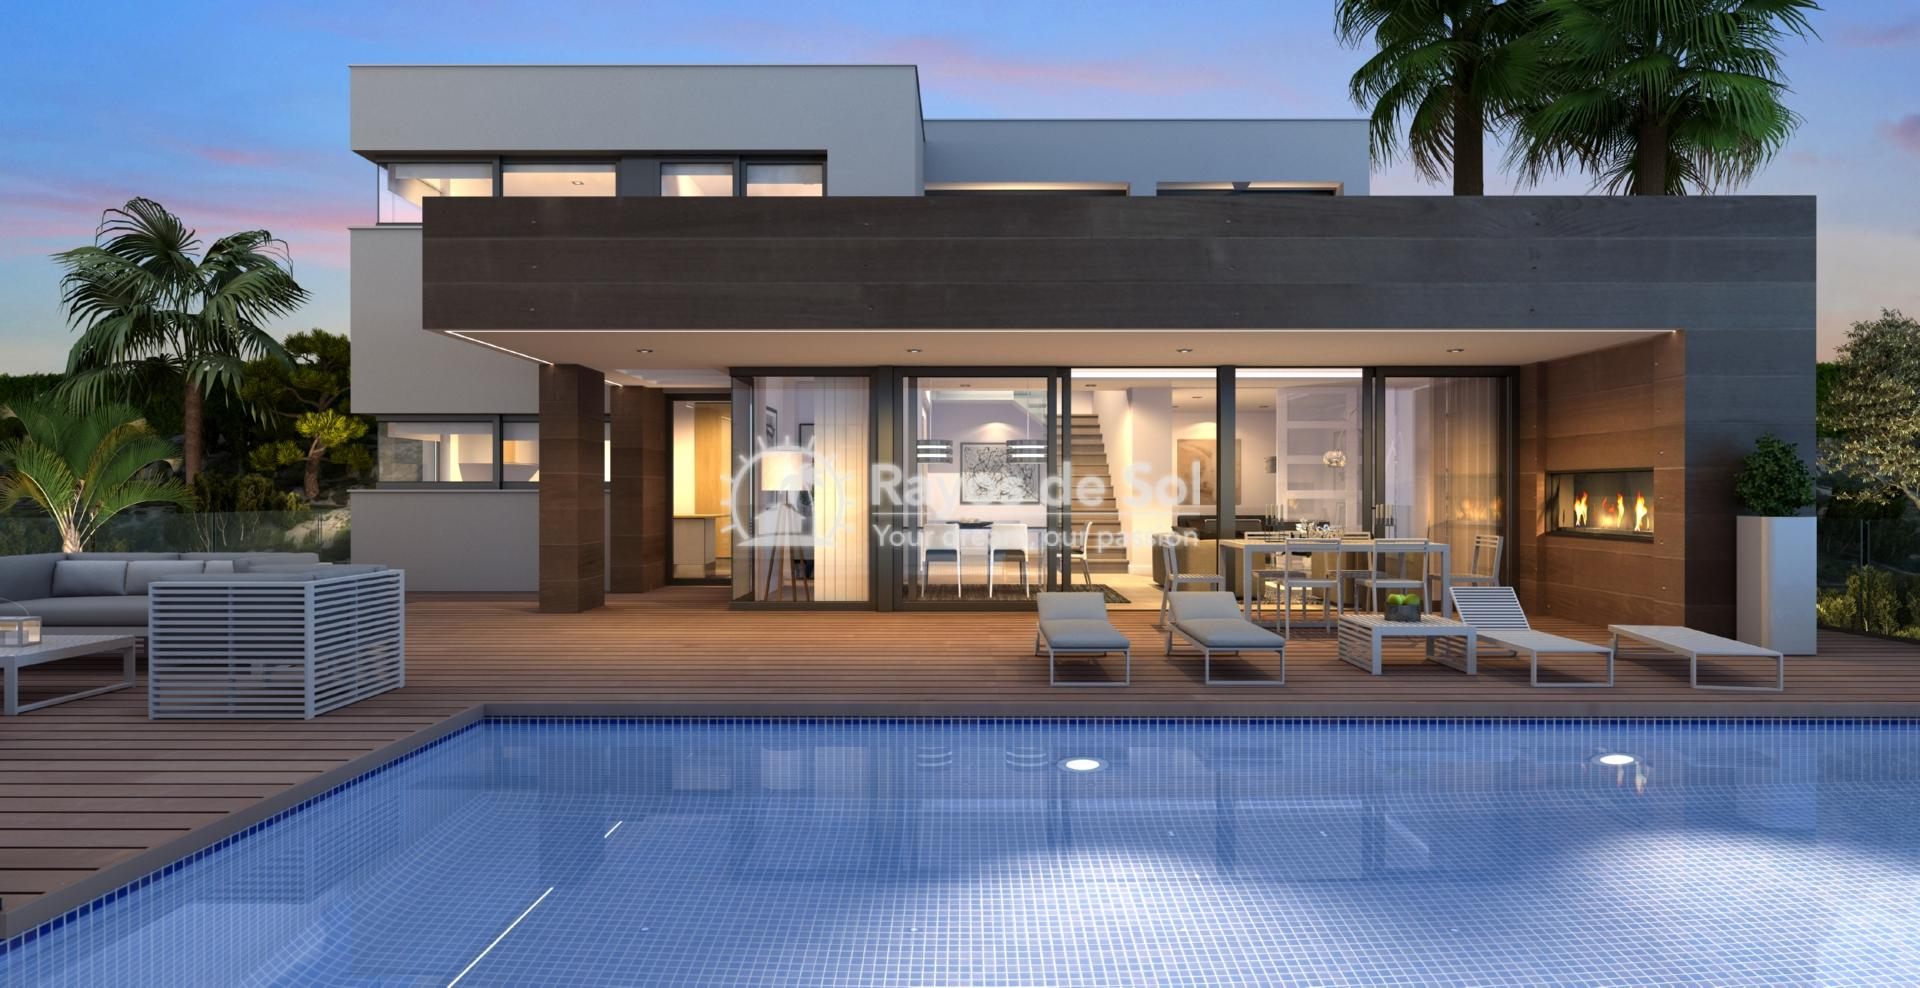 Stunning villa in Cumbre del Sol, Benitachell, Costa Blanca (BEVAJADP) - 2